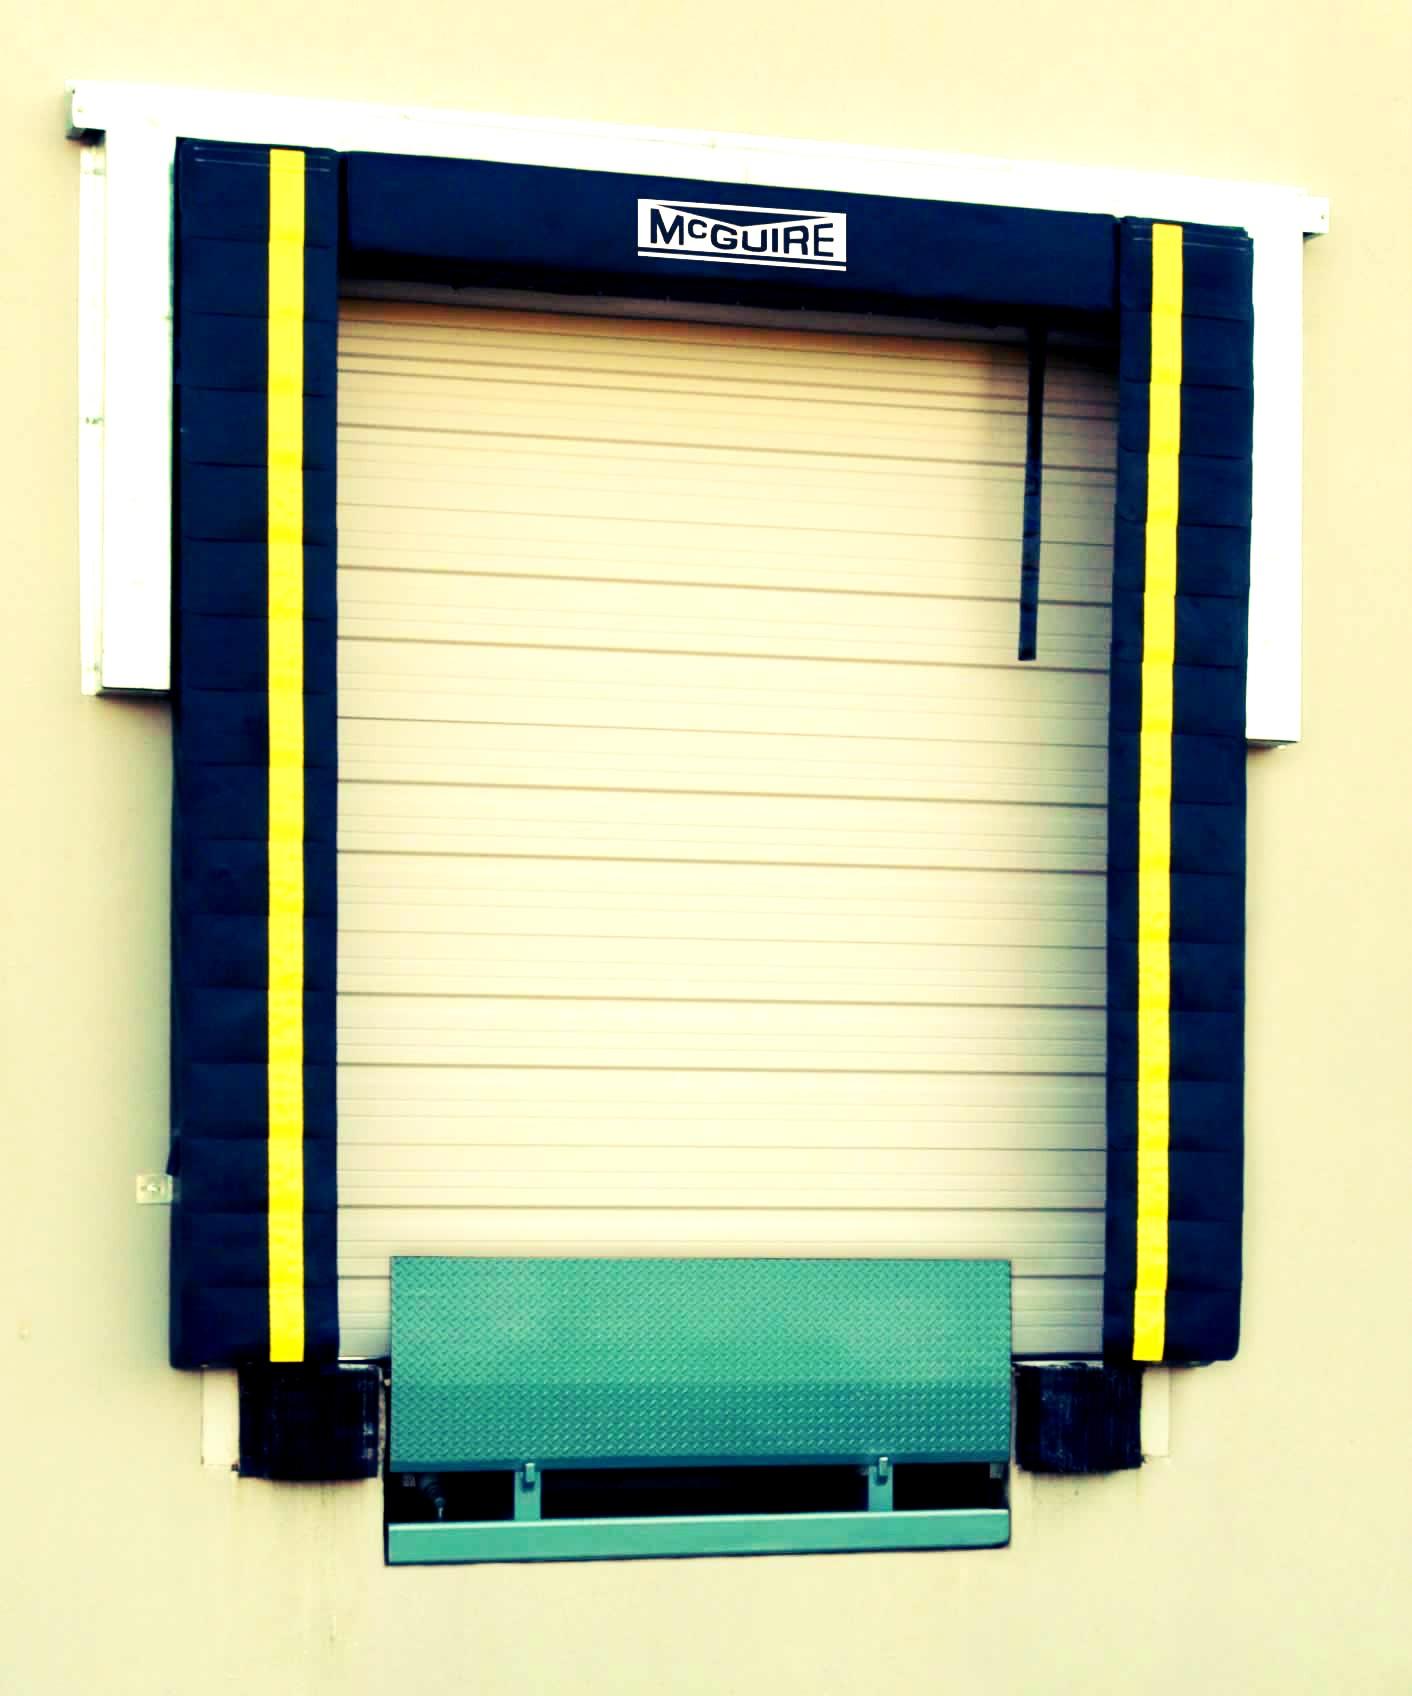 Dock Seal McGuire TS500